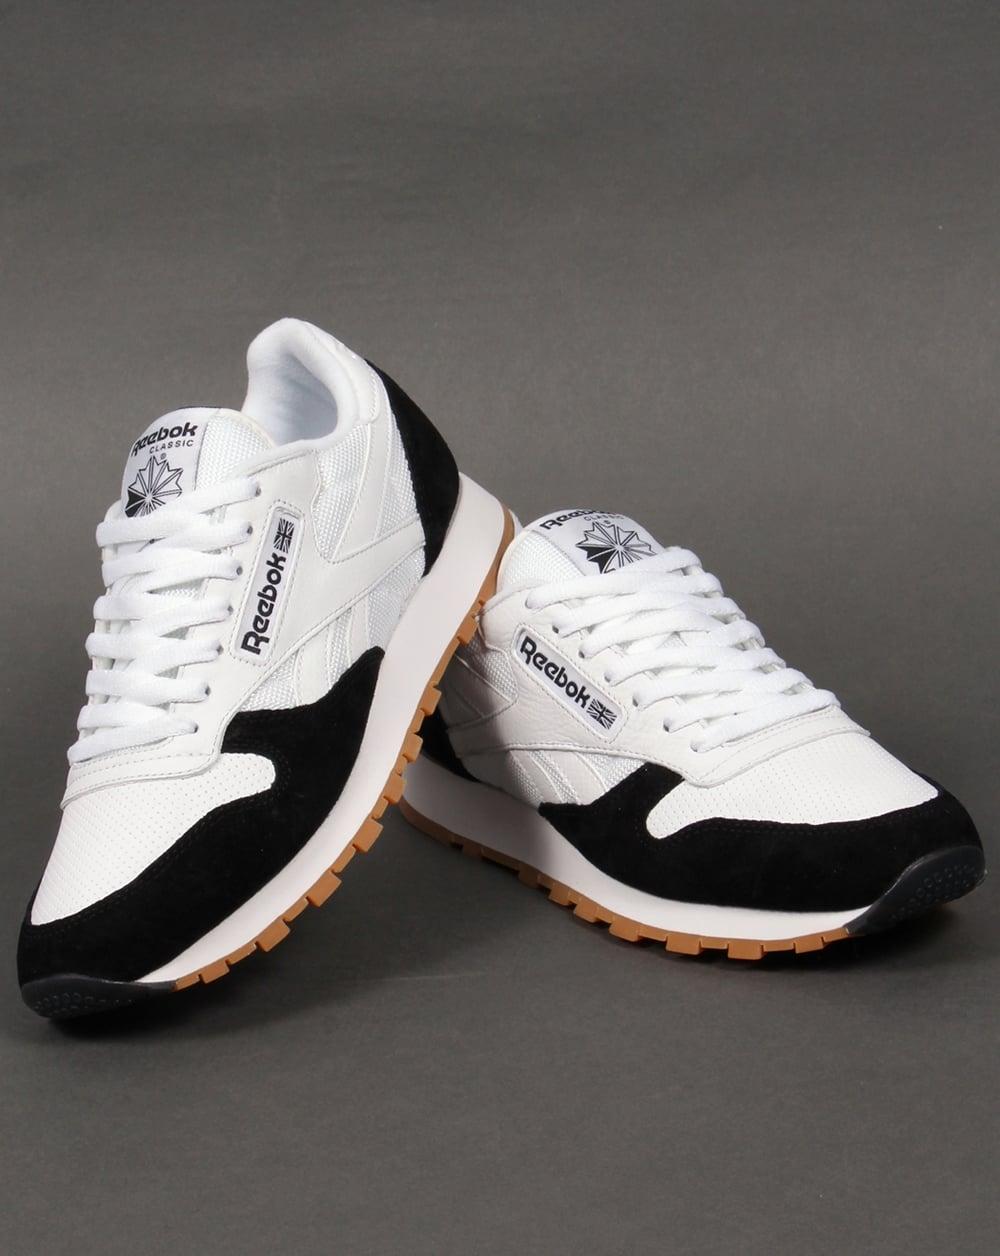 390754f78014dc Reebok Classic Leather Perfect Split Trainers White Black